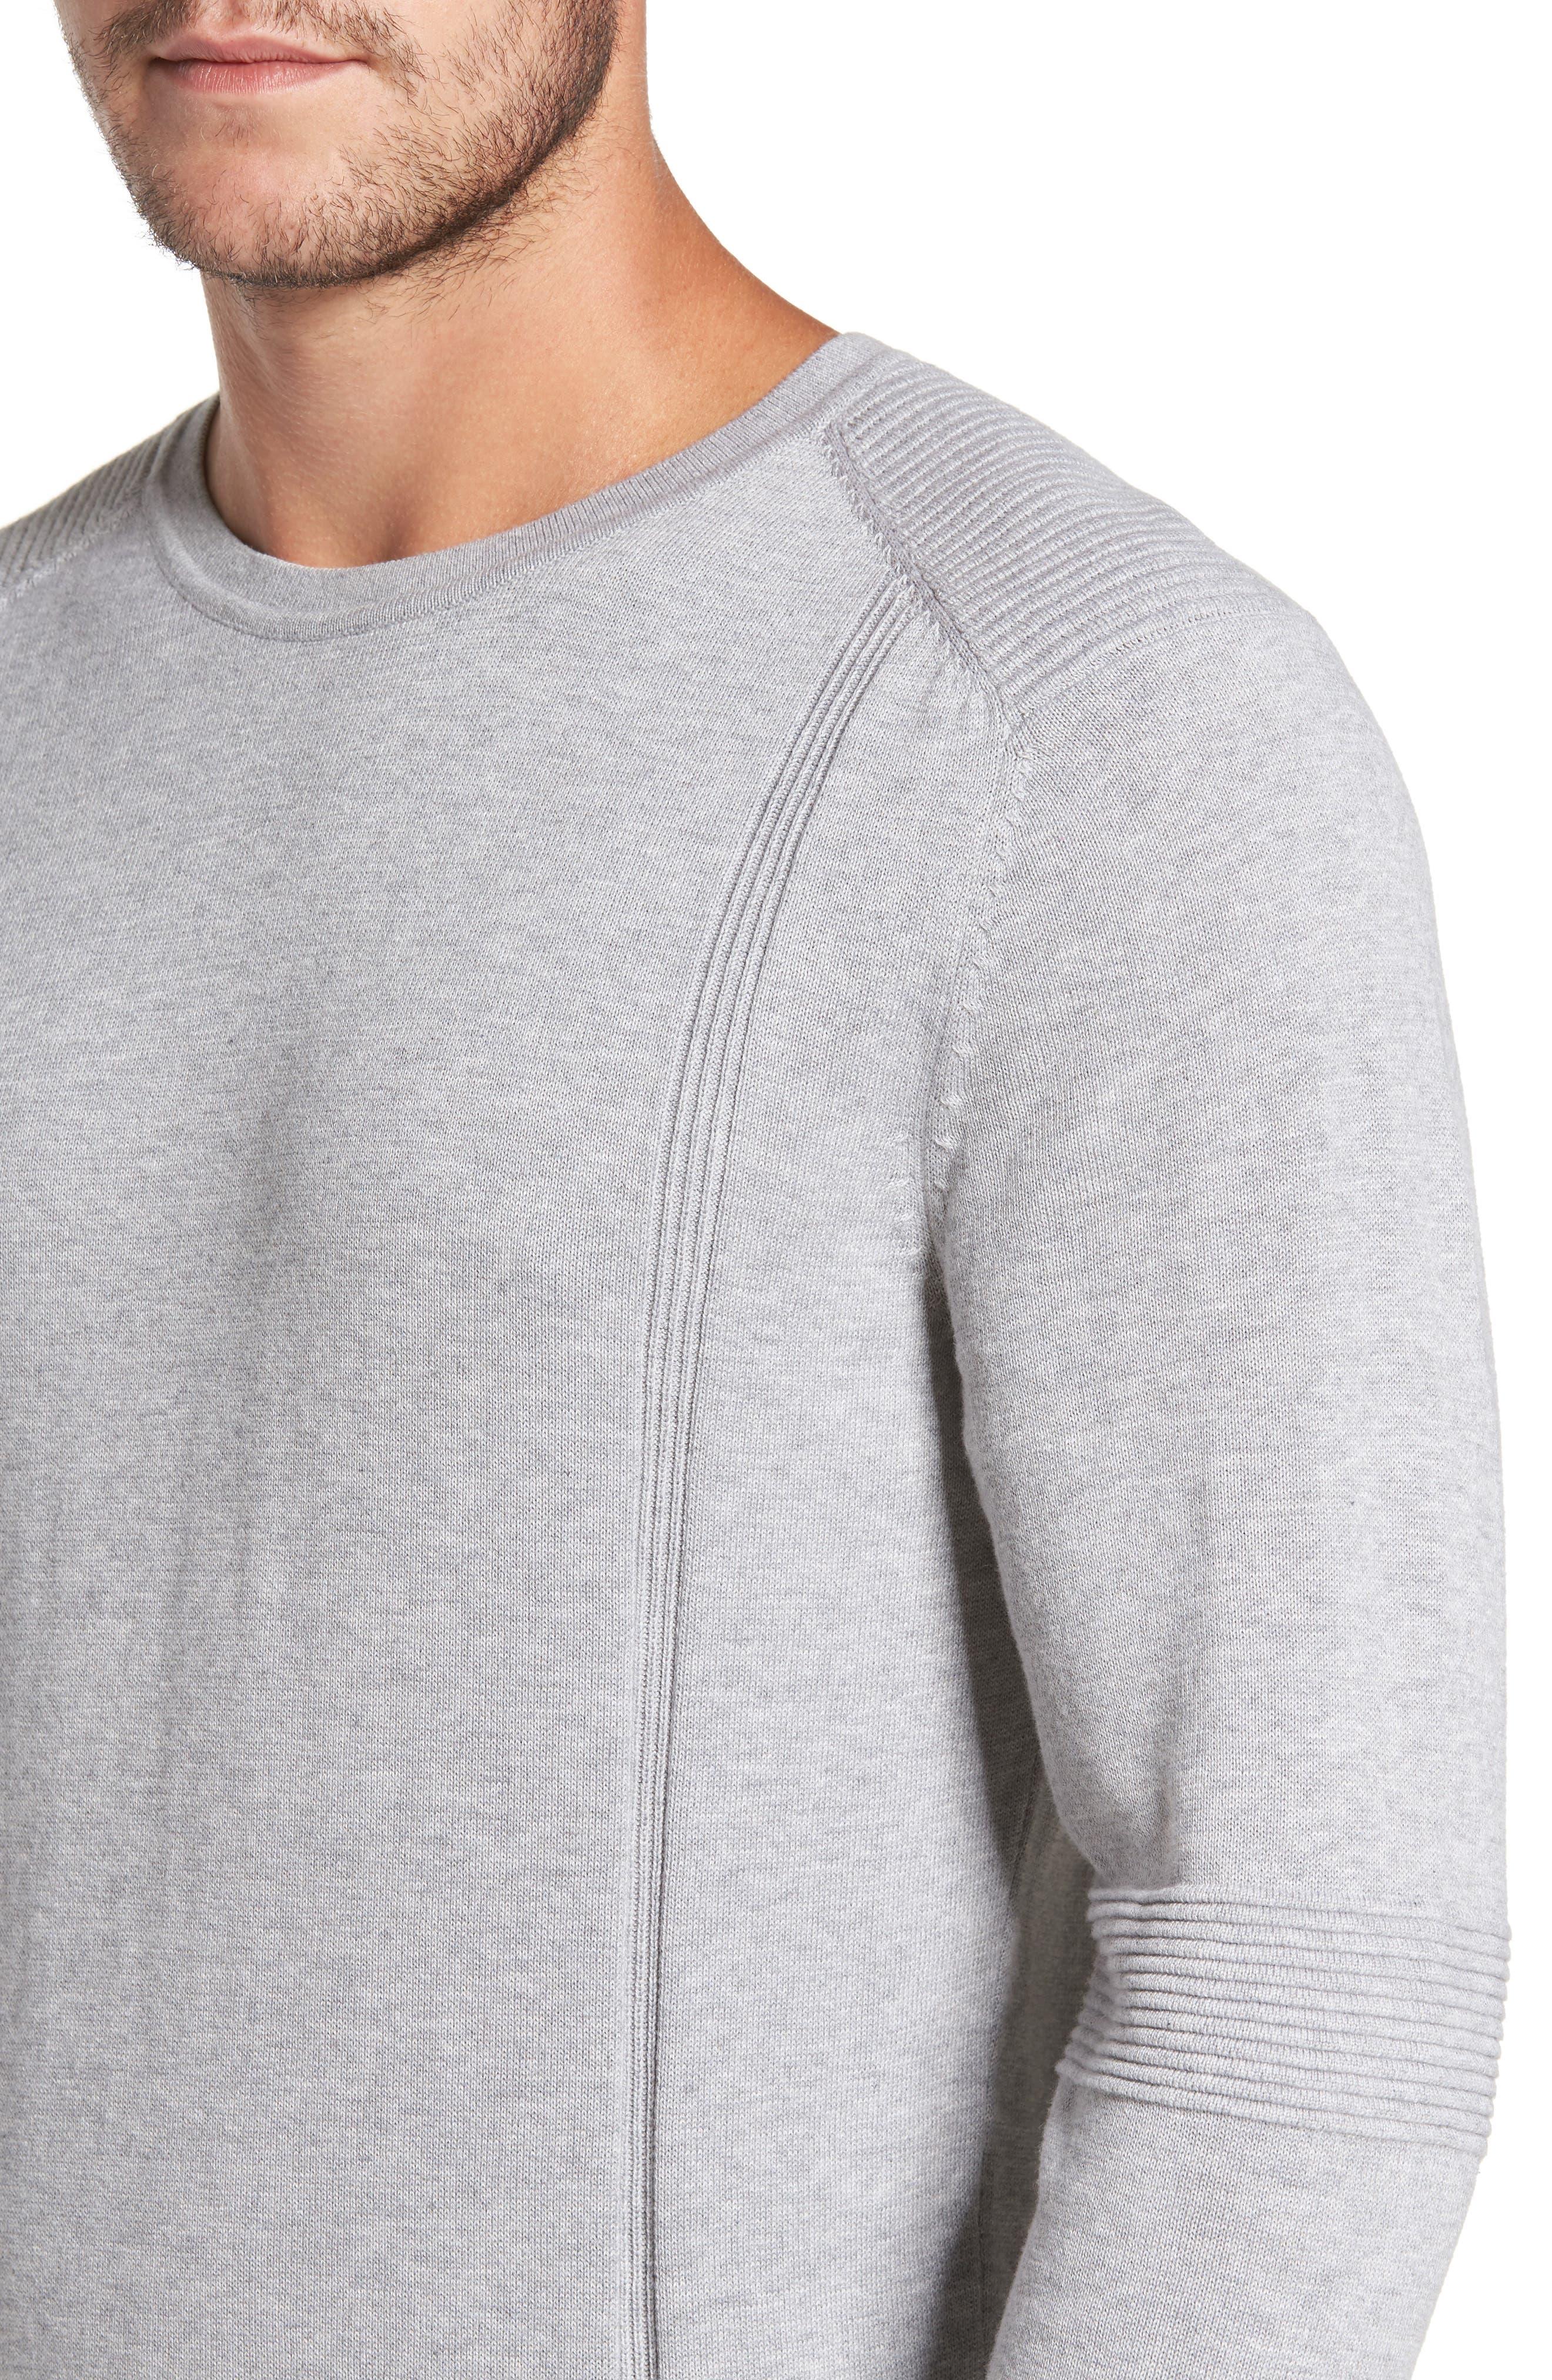 R18 Chopper Rib Detail Sweater,                             Alternate thumbnail 4, color,                             078